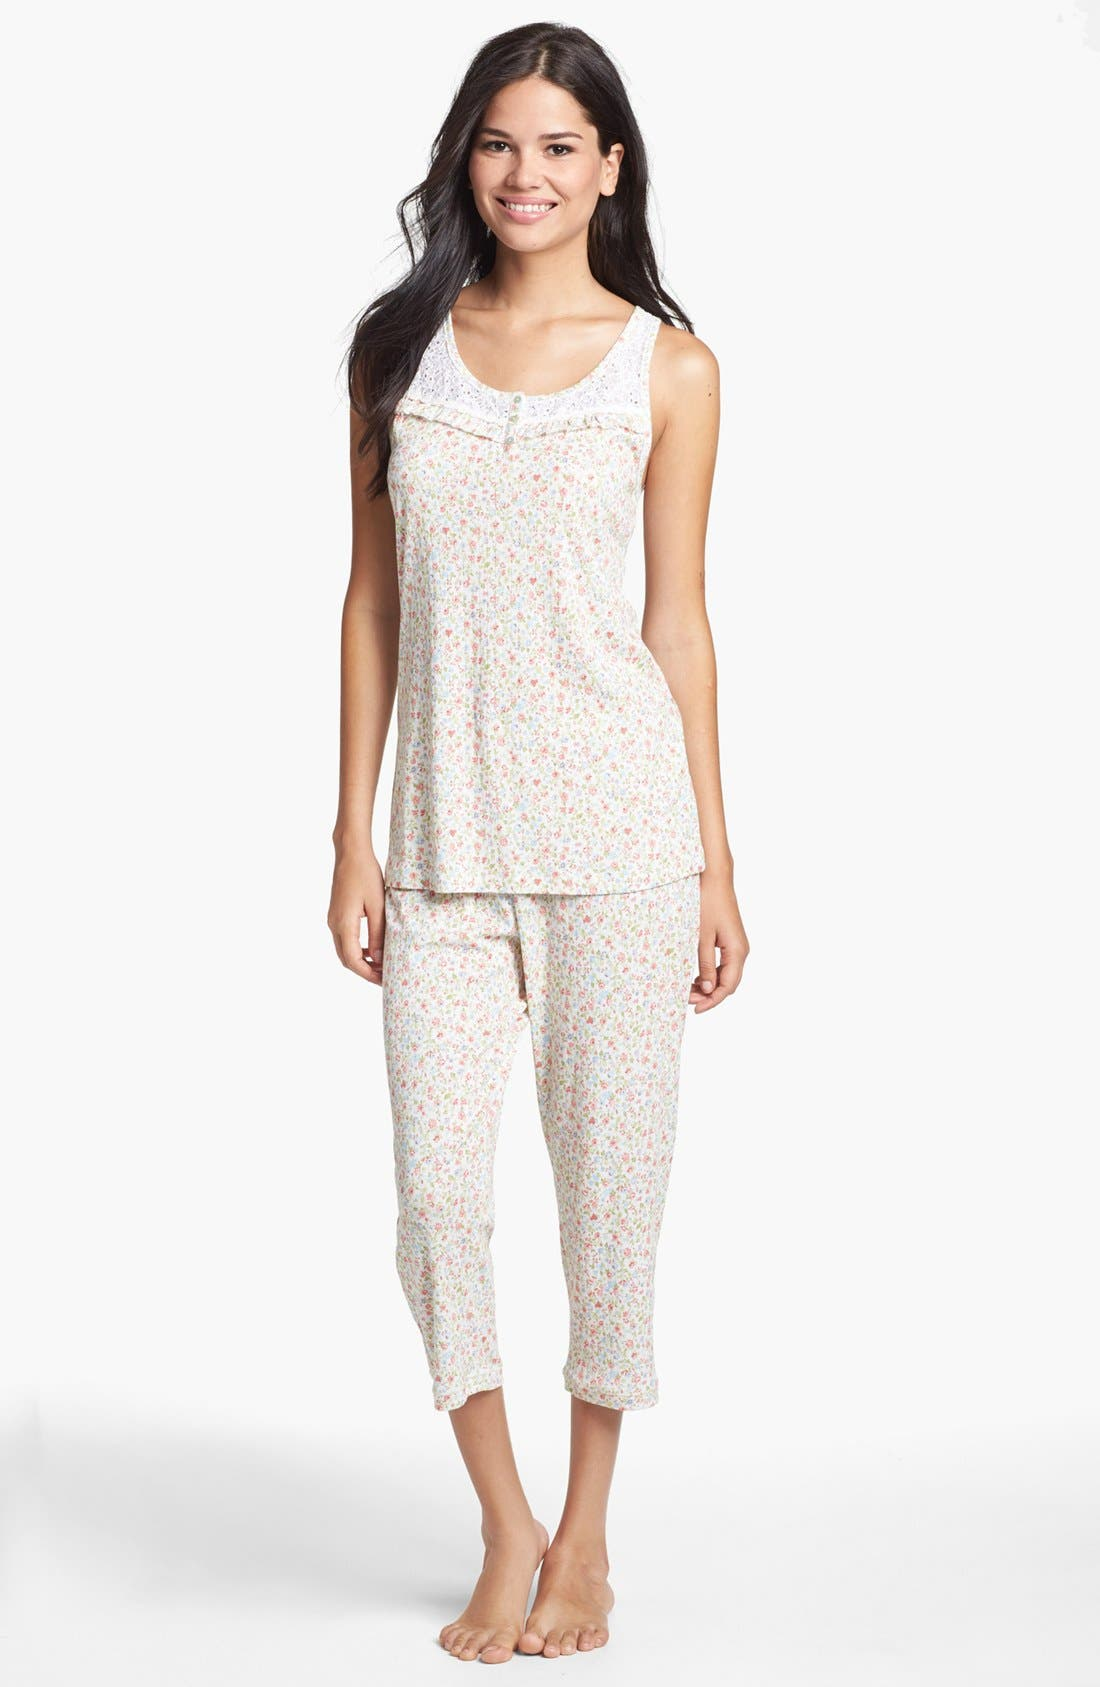 Alternate Image 1 Selected - Carole Hochman Designs 'Liberty Floral' Capri Pajamas